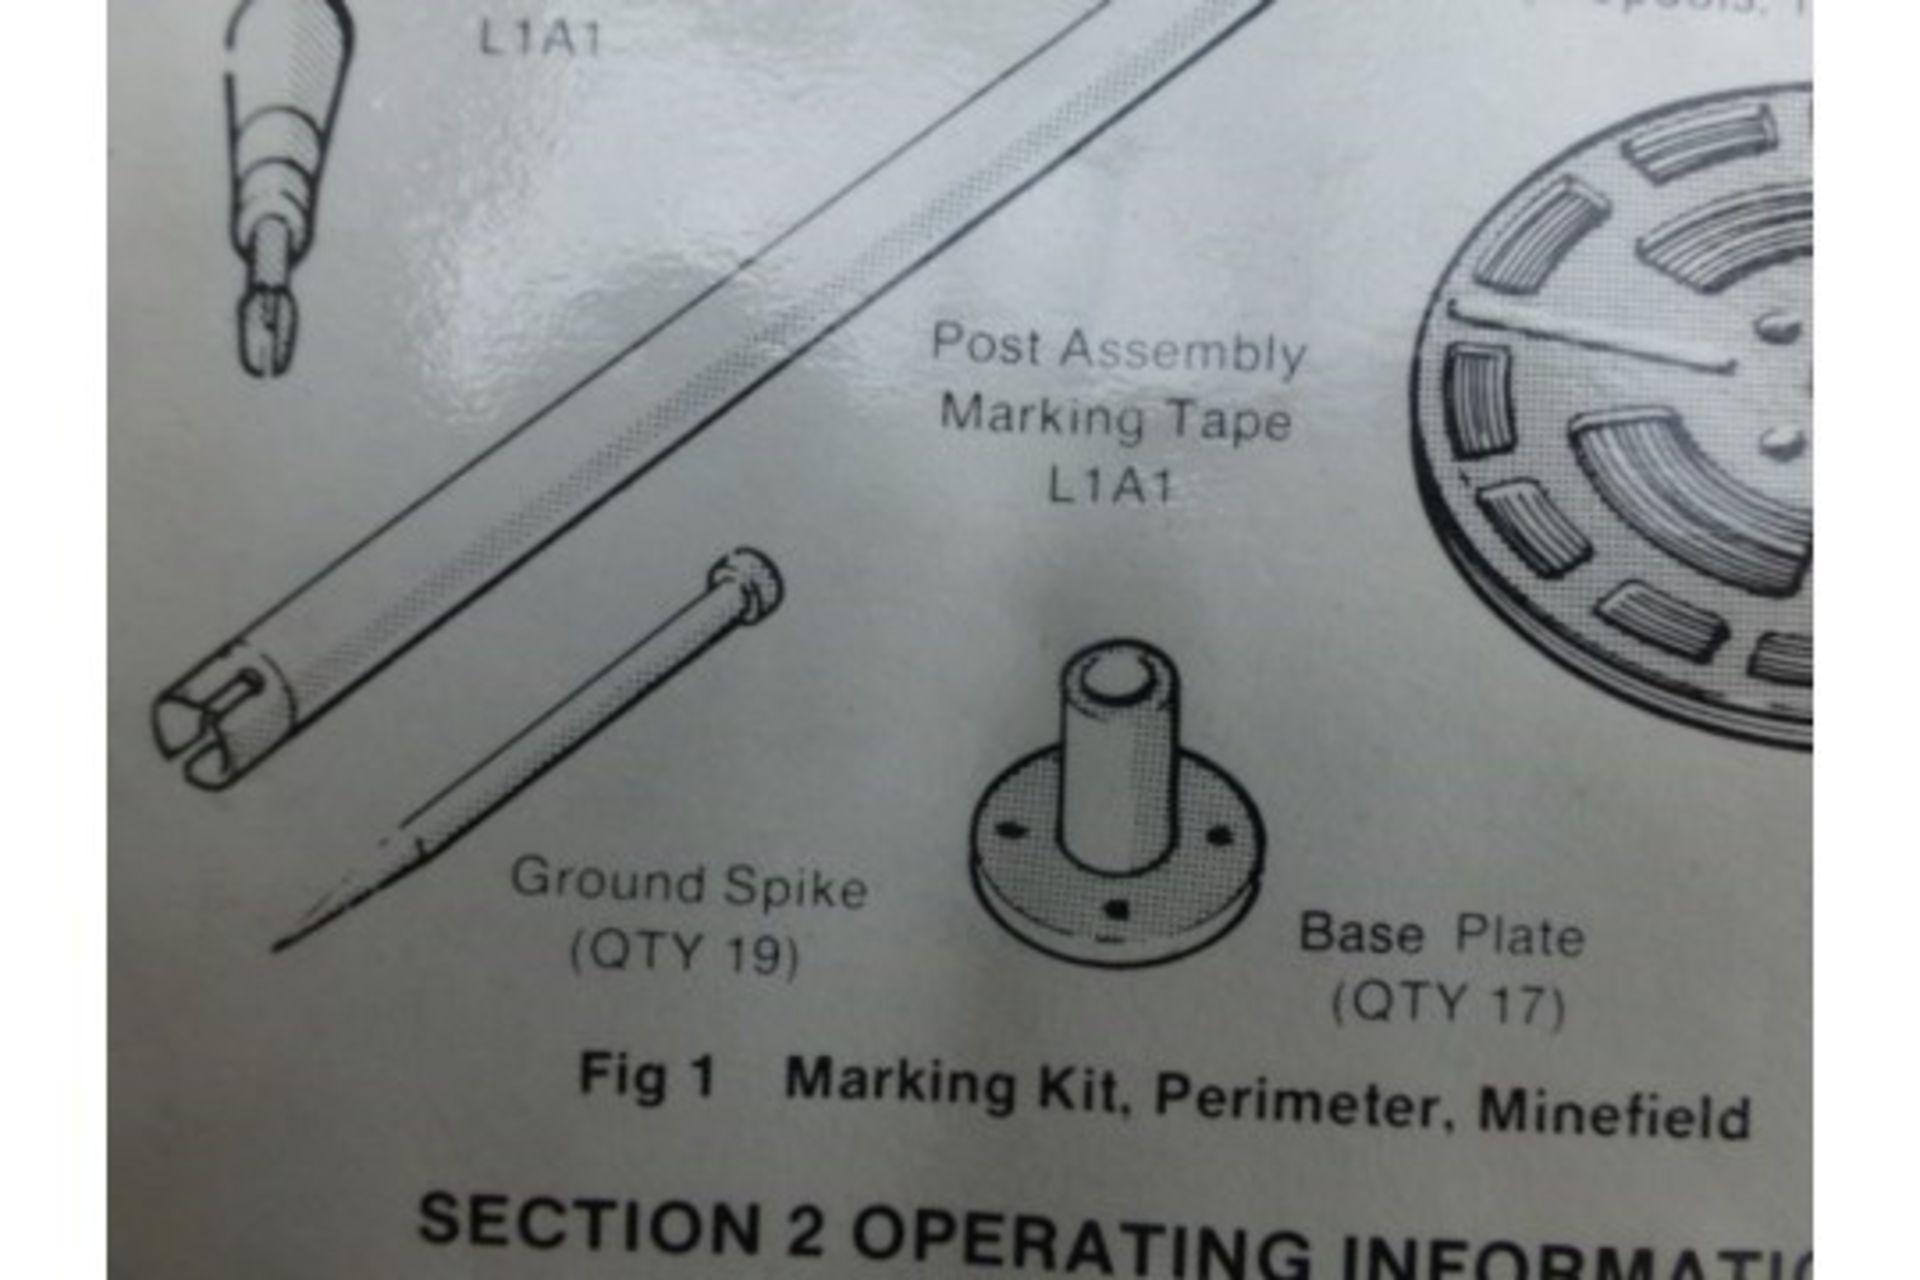 Lot 26816 - 5 x Perimeter Marking Kits